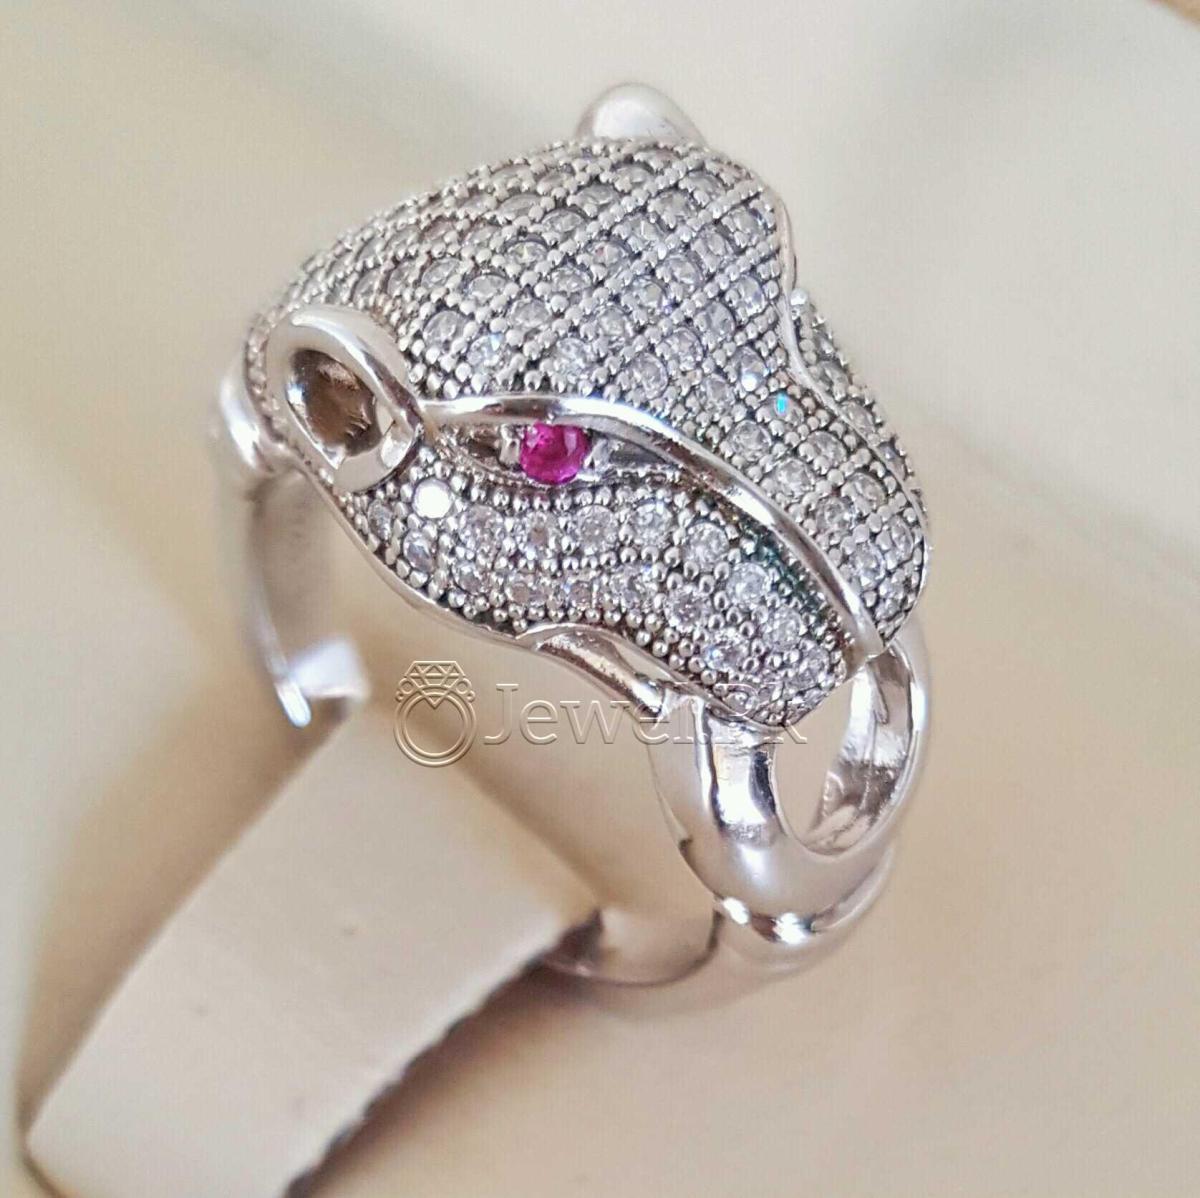 925 Silver Luxury Rings for Ladies Women Silver Rings Woman Handmade Rings 3 1 natural gemstones pakistan + 925 silver jewelry online